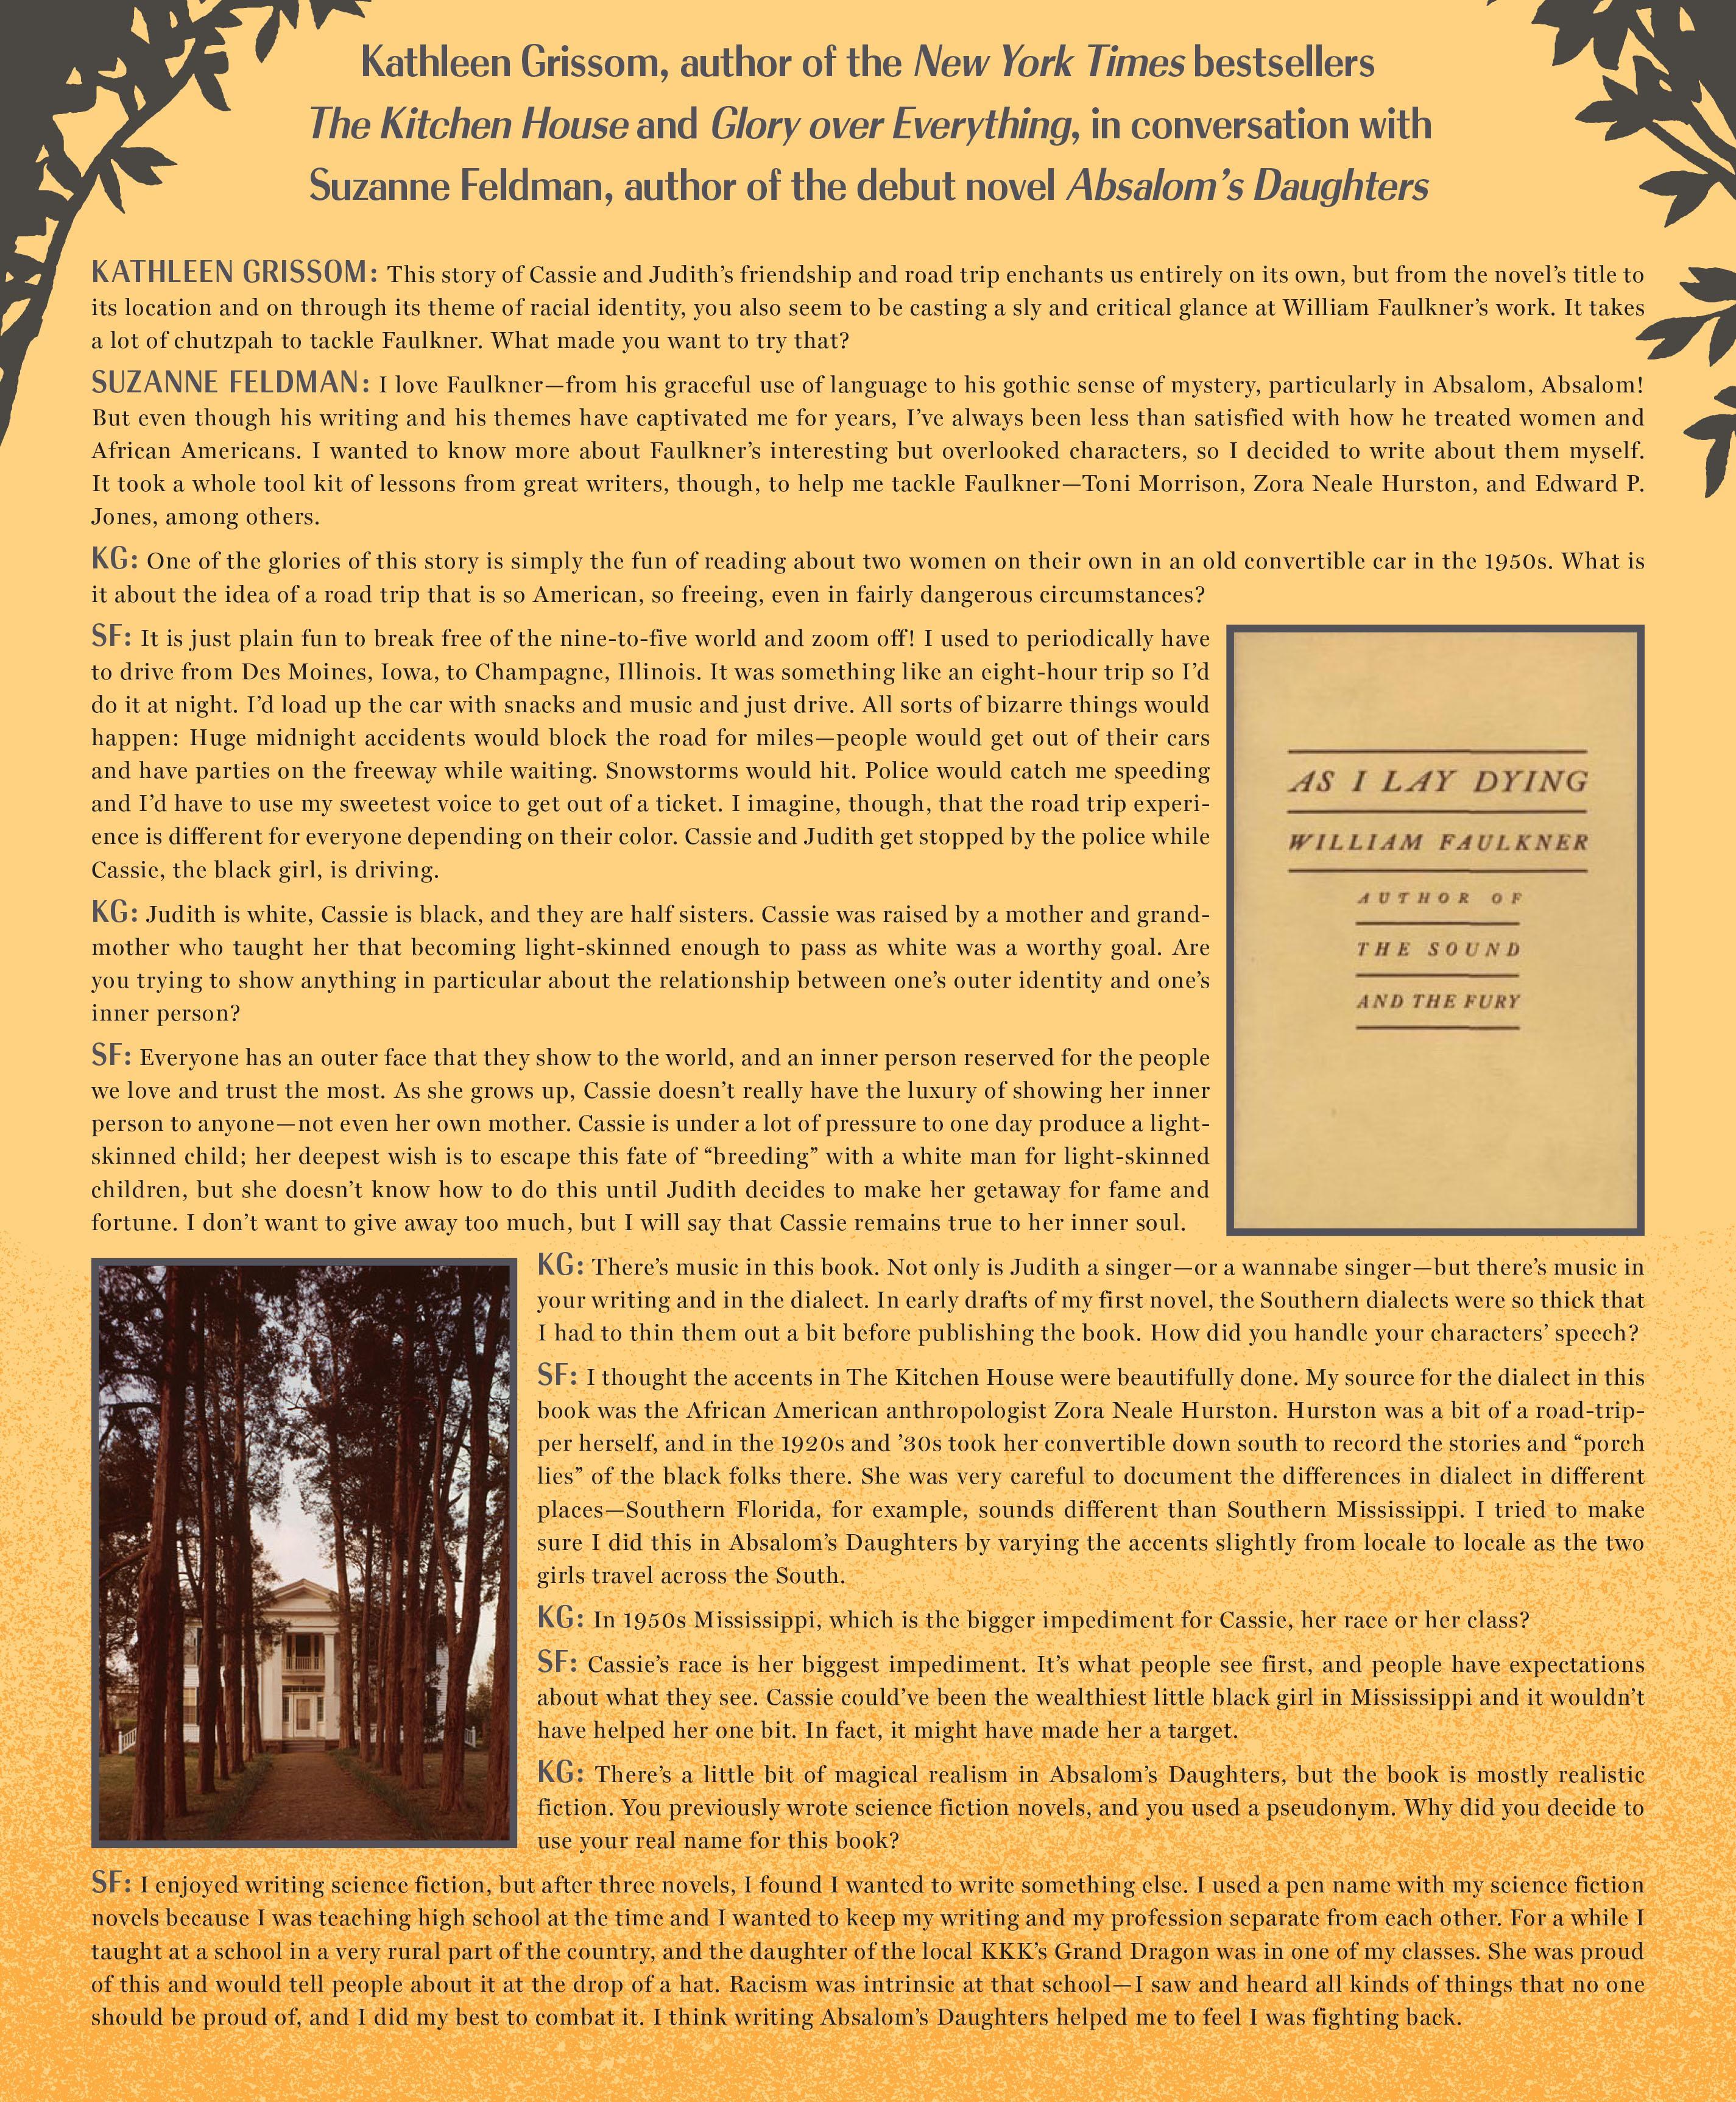 History of apple inc essay